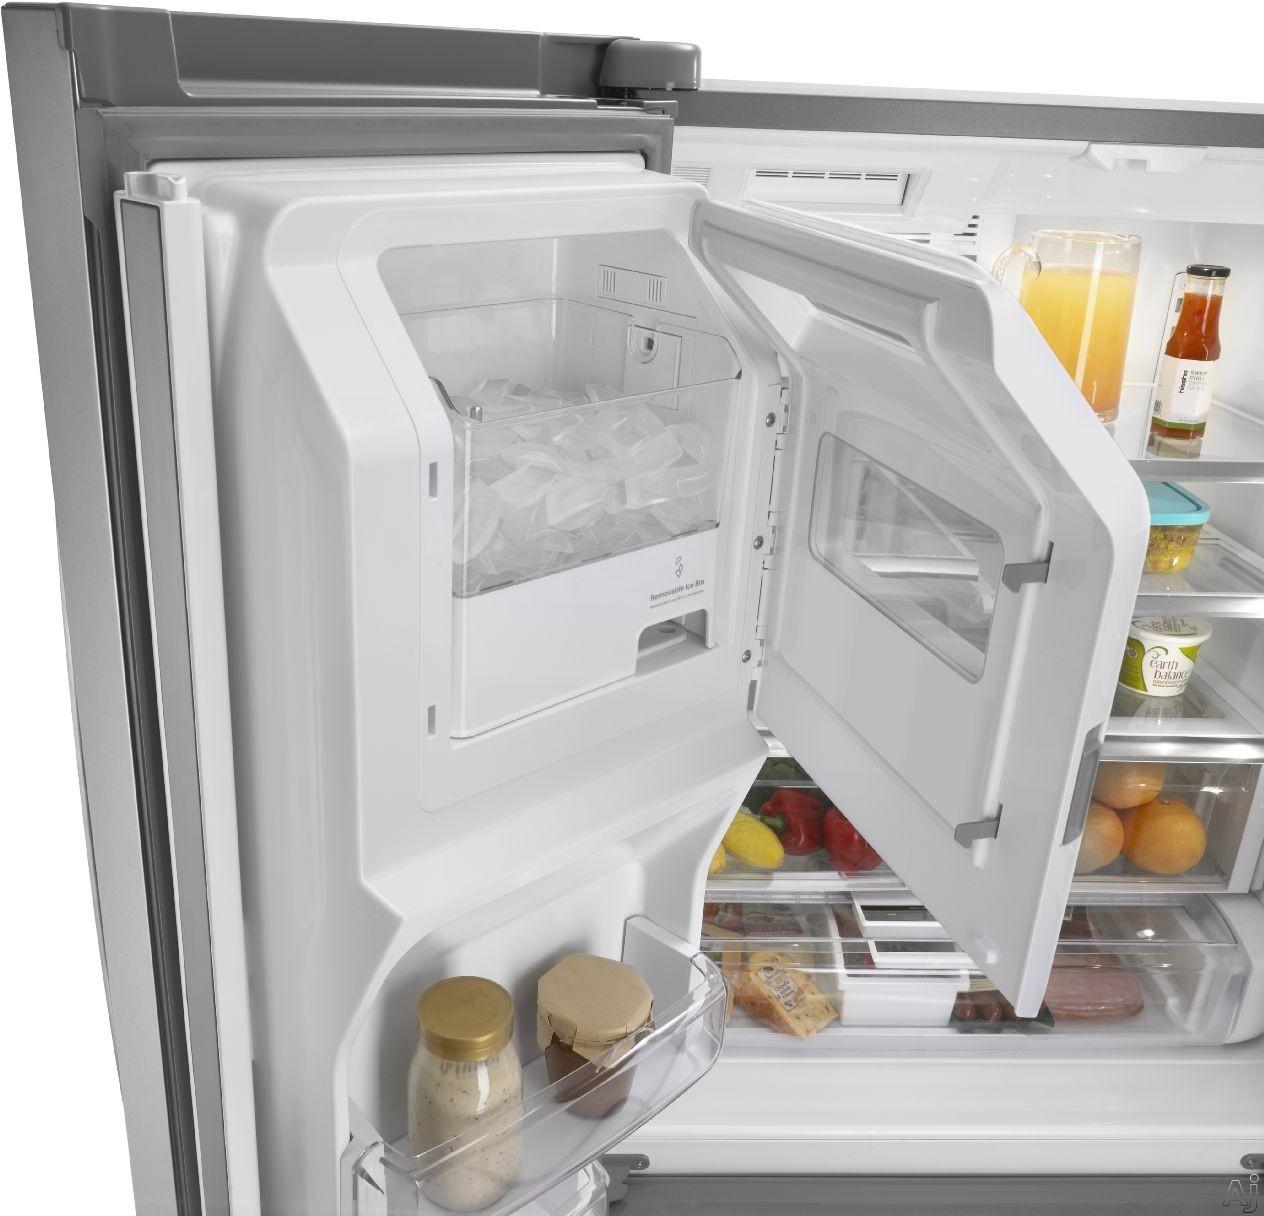 Maytag Mft2776dem 26 8 Cu Ft French Door Refrigerator